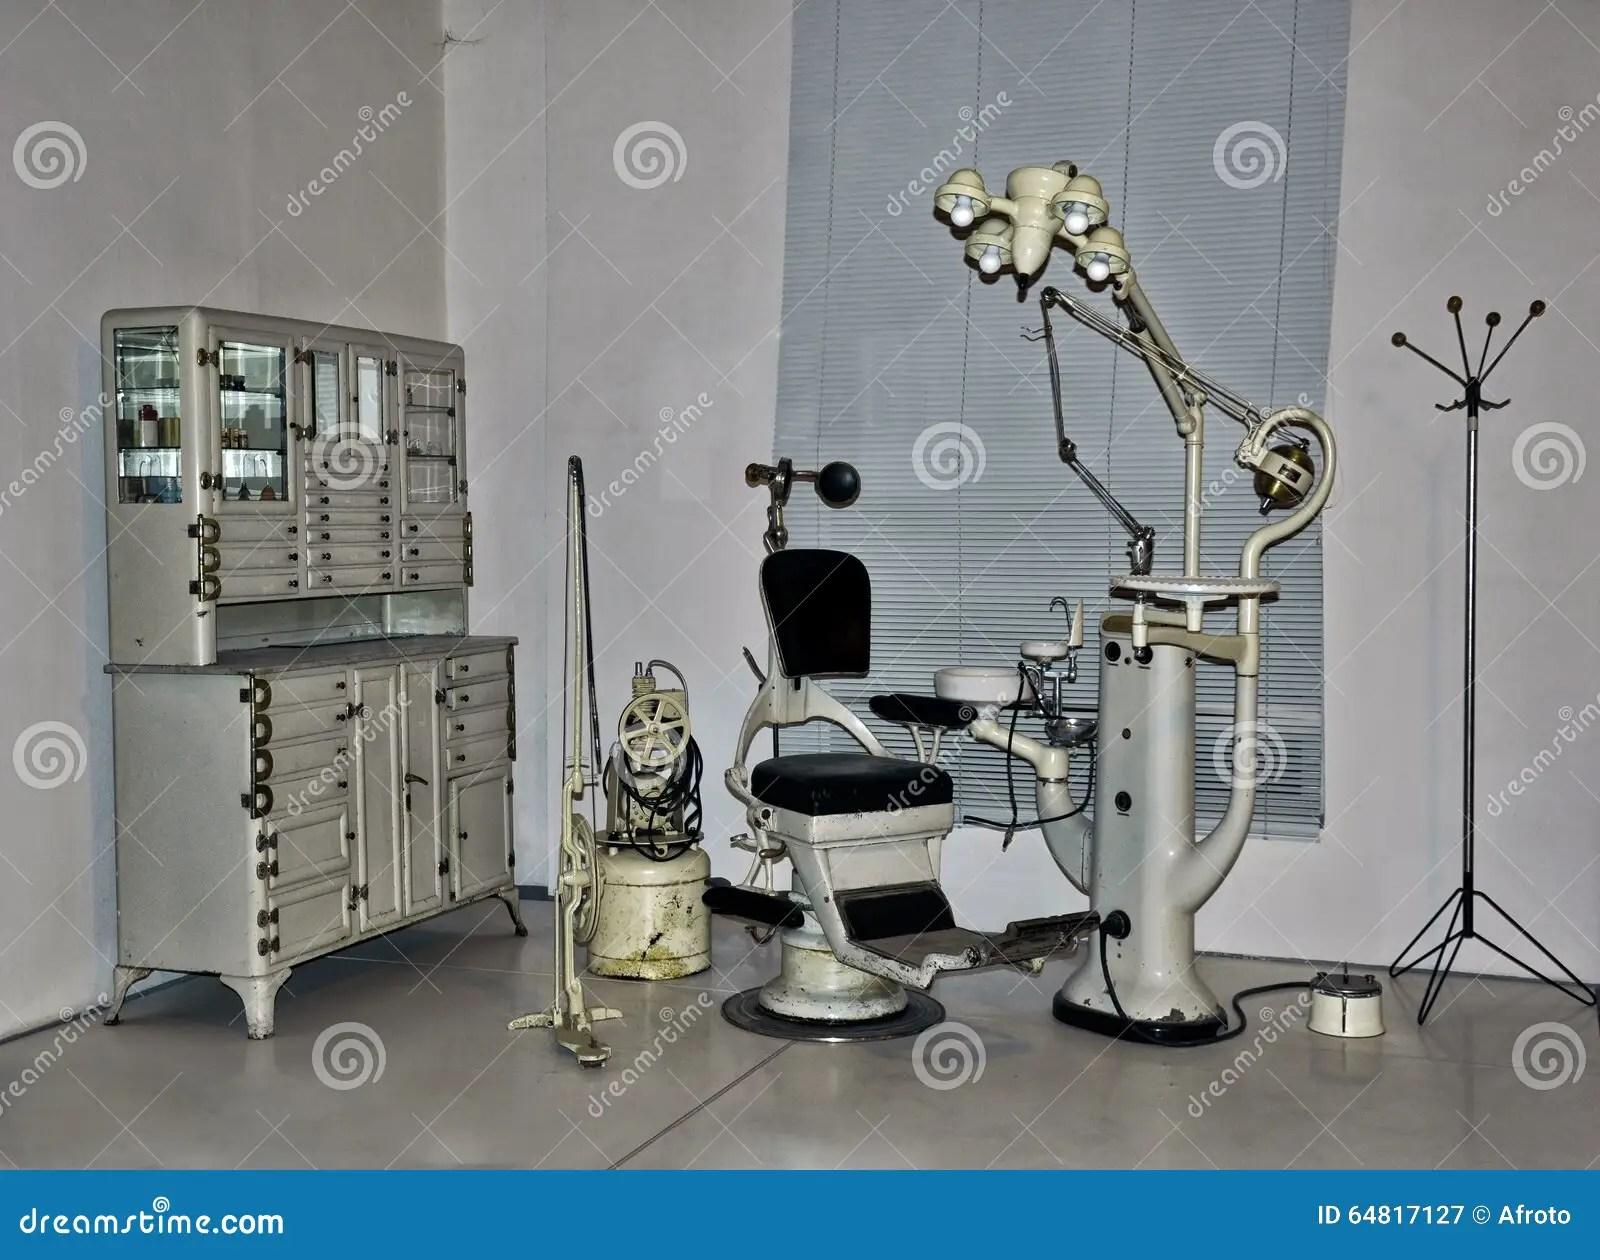 vintage dentist chair target spider web tools medical equipment in retro cartoon